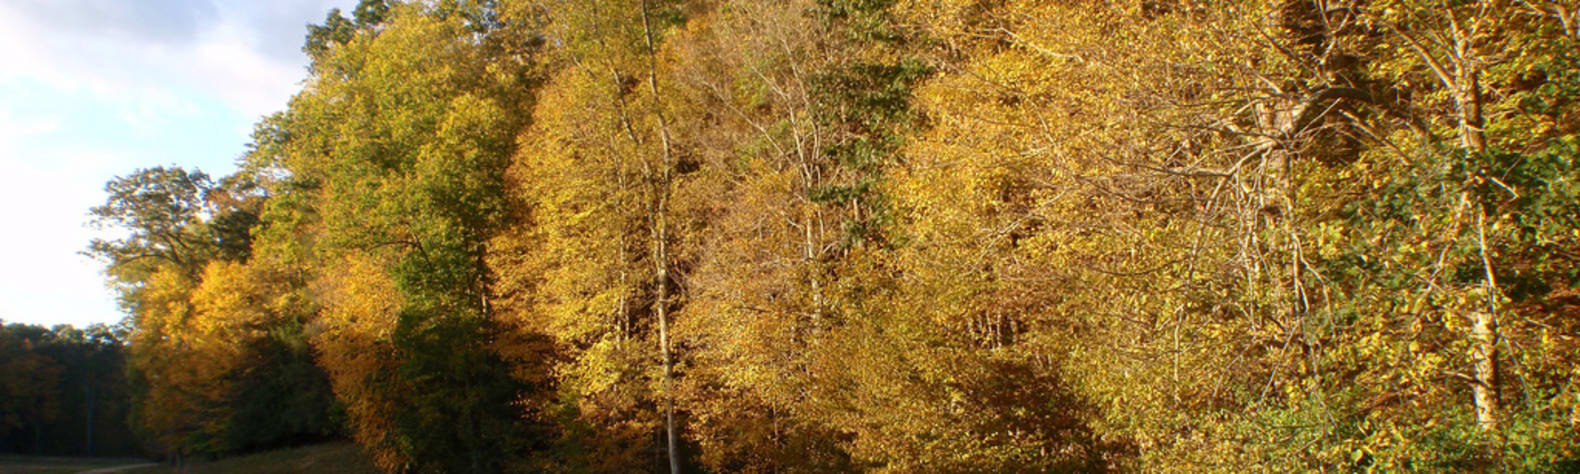 Hurd State Park